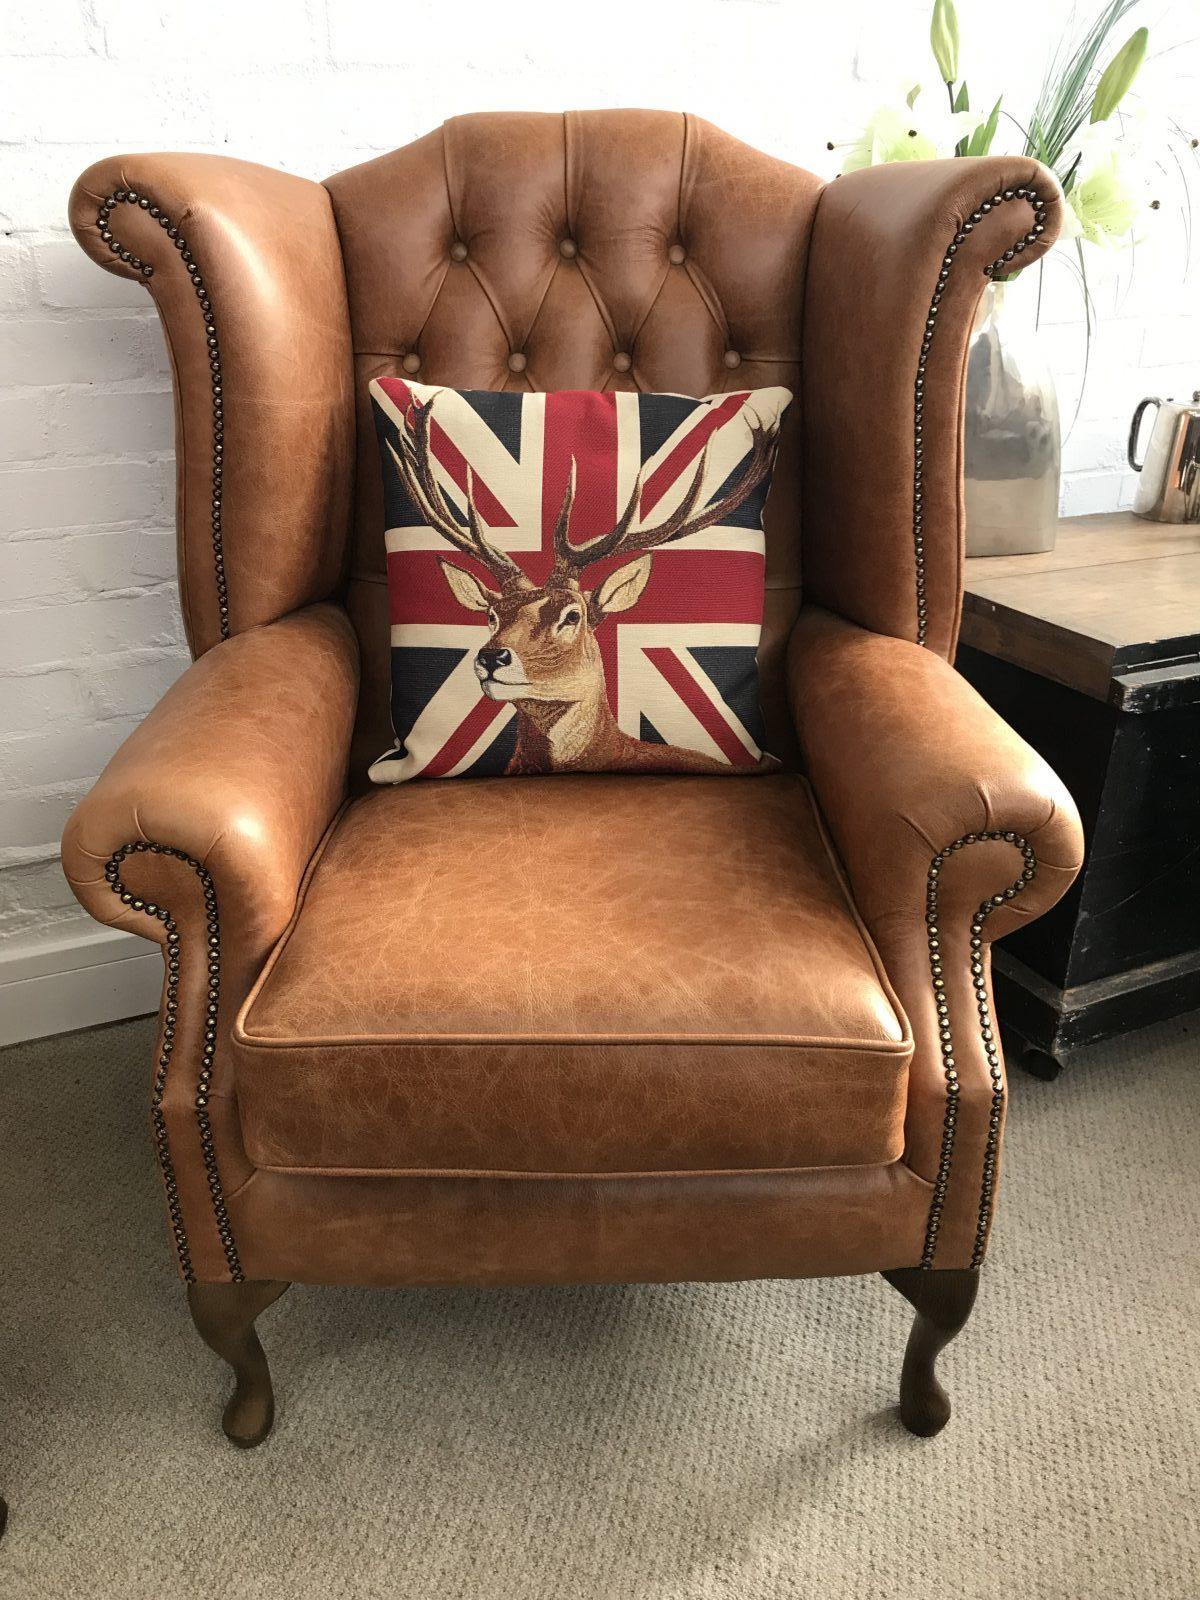 Stunning Tan Queen Anne Wingback Armchair.